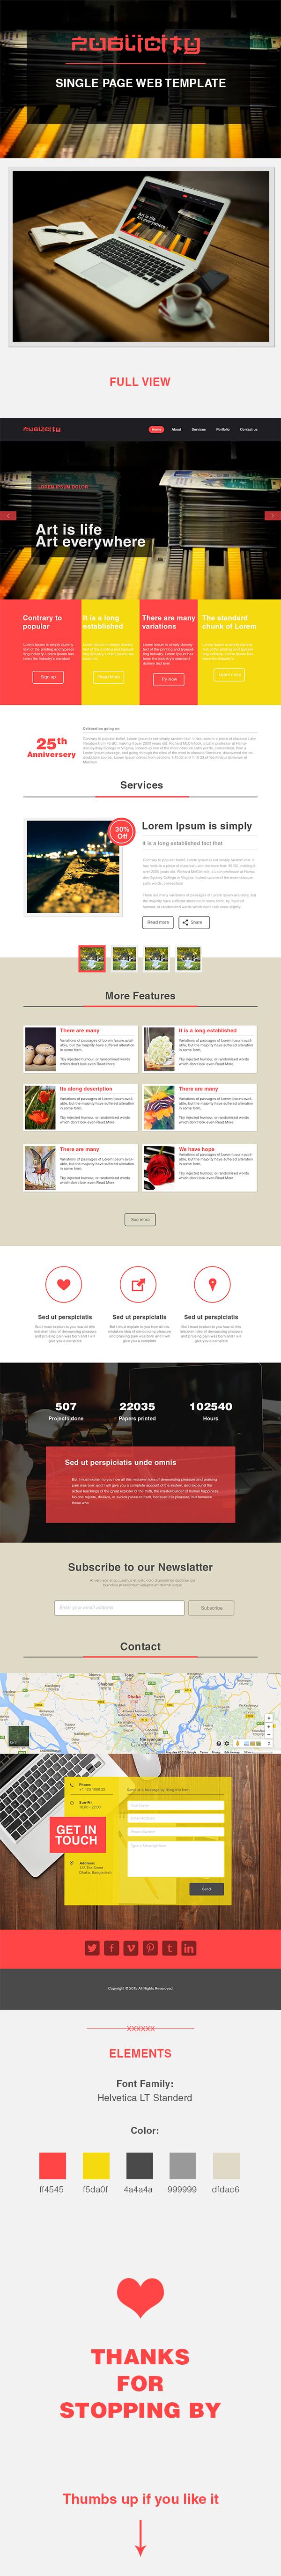 Website web layout one pahe gesign UI ux signle page design web page mock up Modern Design Agency website service provider website clean layout elehant 960 Grid Wide screen